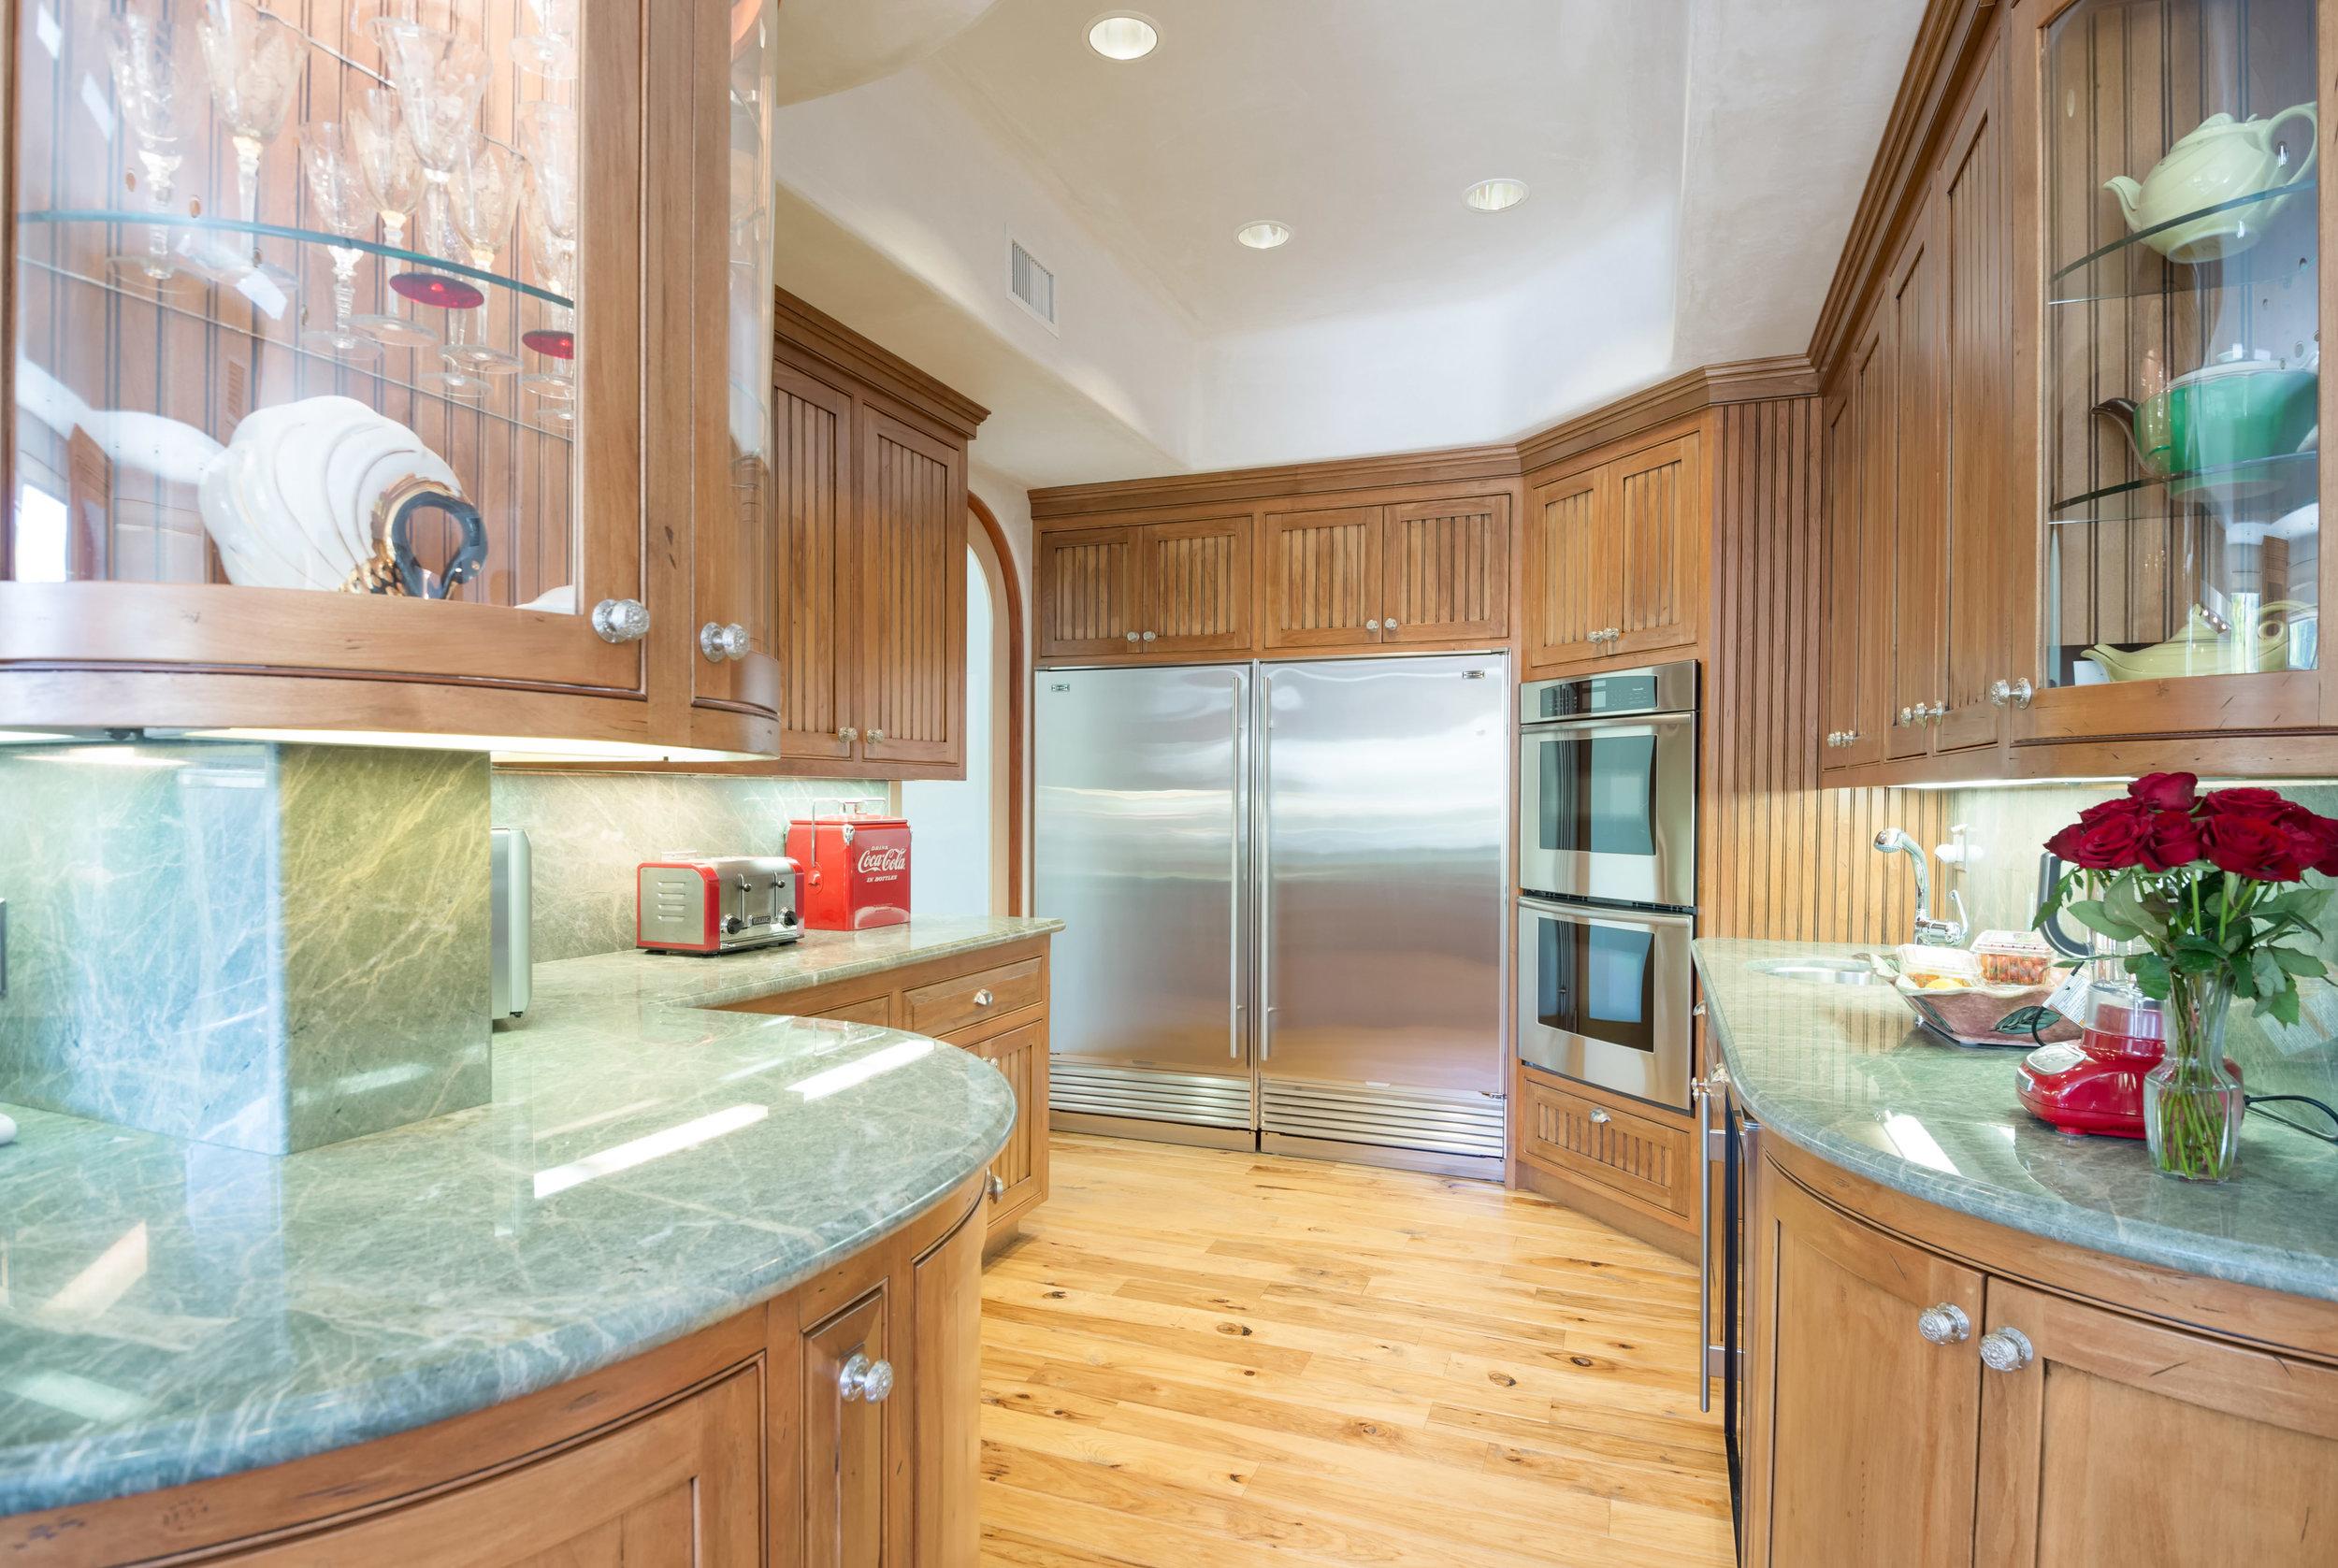 009 kitchen 2 6405 bonsall Malibu For Sale The Malibu Life Team Luxury Real Estate.jpg